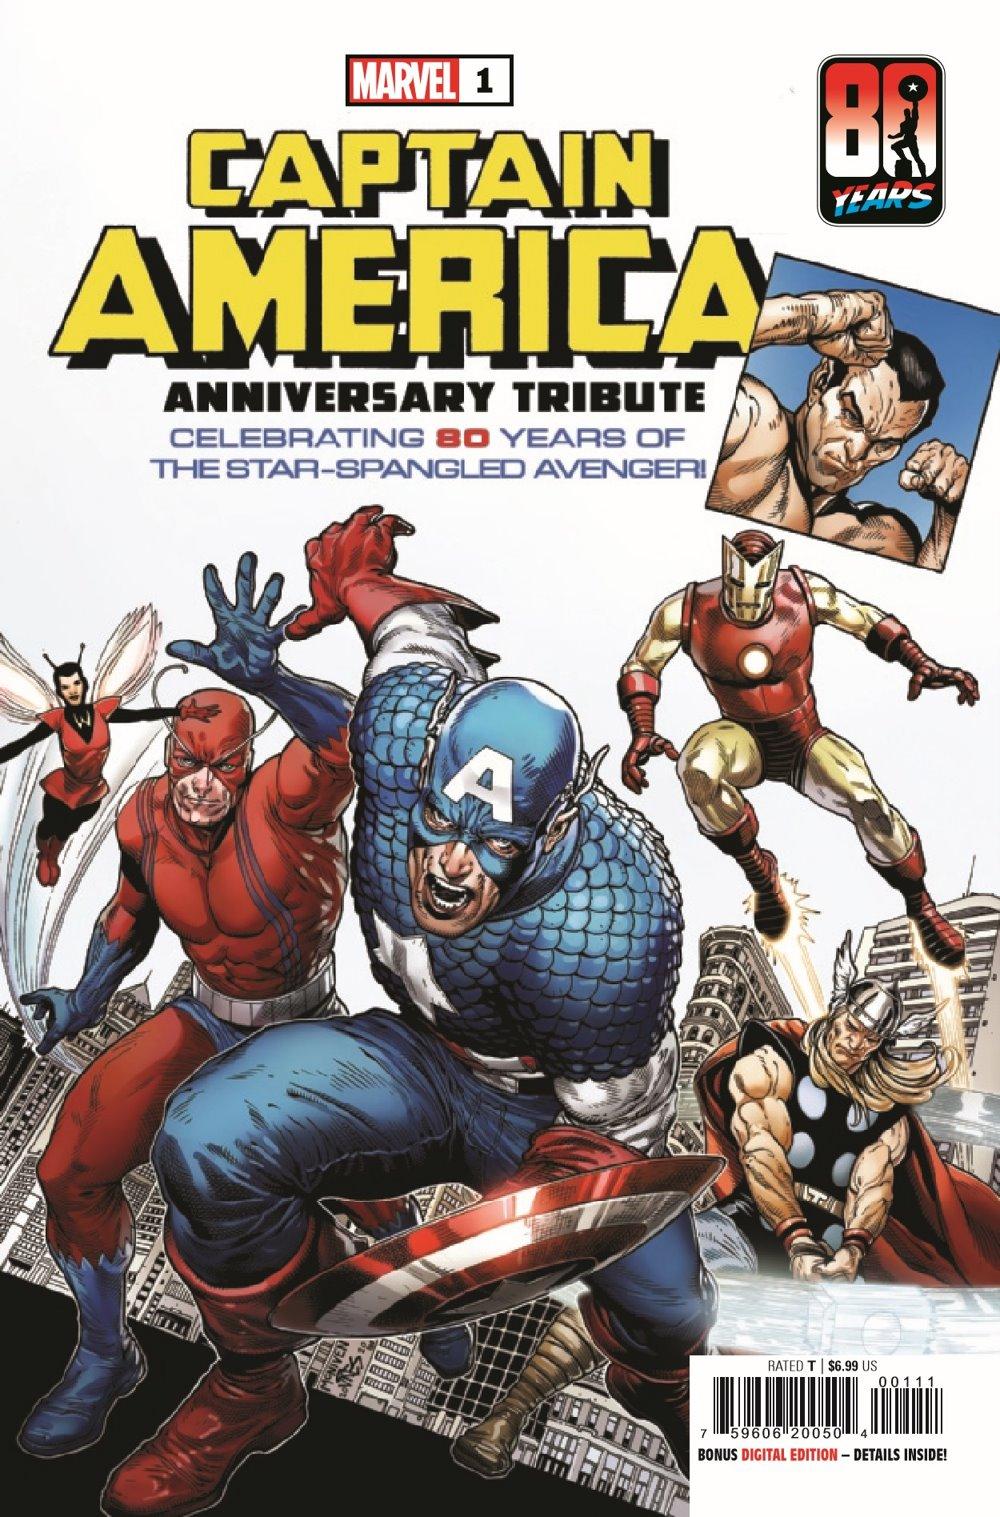 CAPAANNIVERSARY2021001_Preview-1 ComicList Previews: CAPTAIN AMERICA ANNIVERSARY TRIBUTE #1